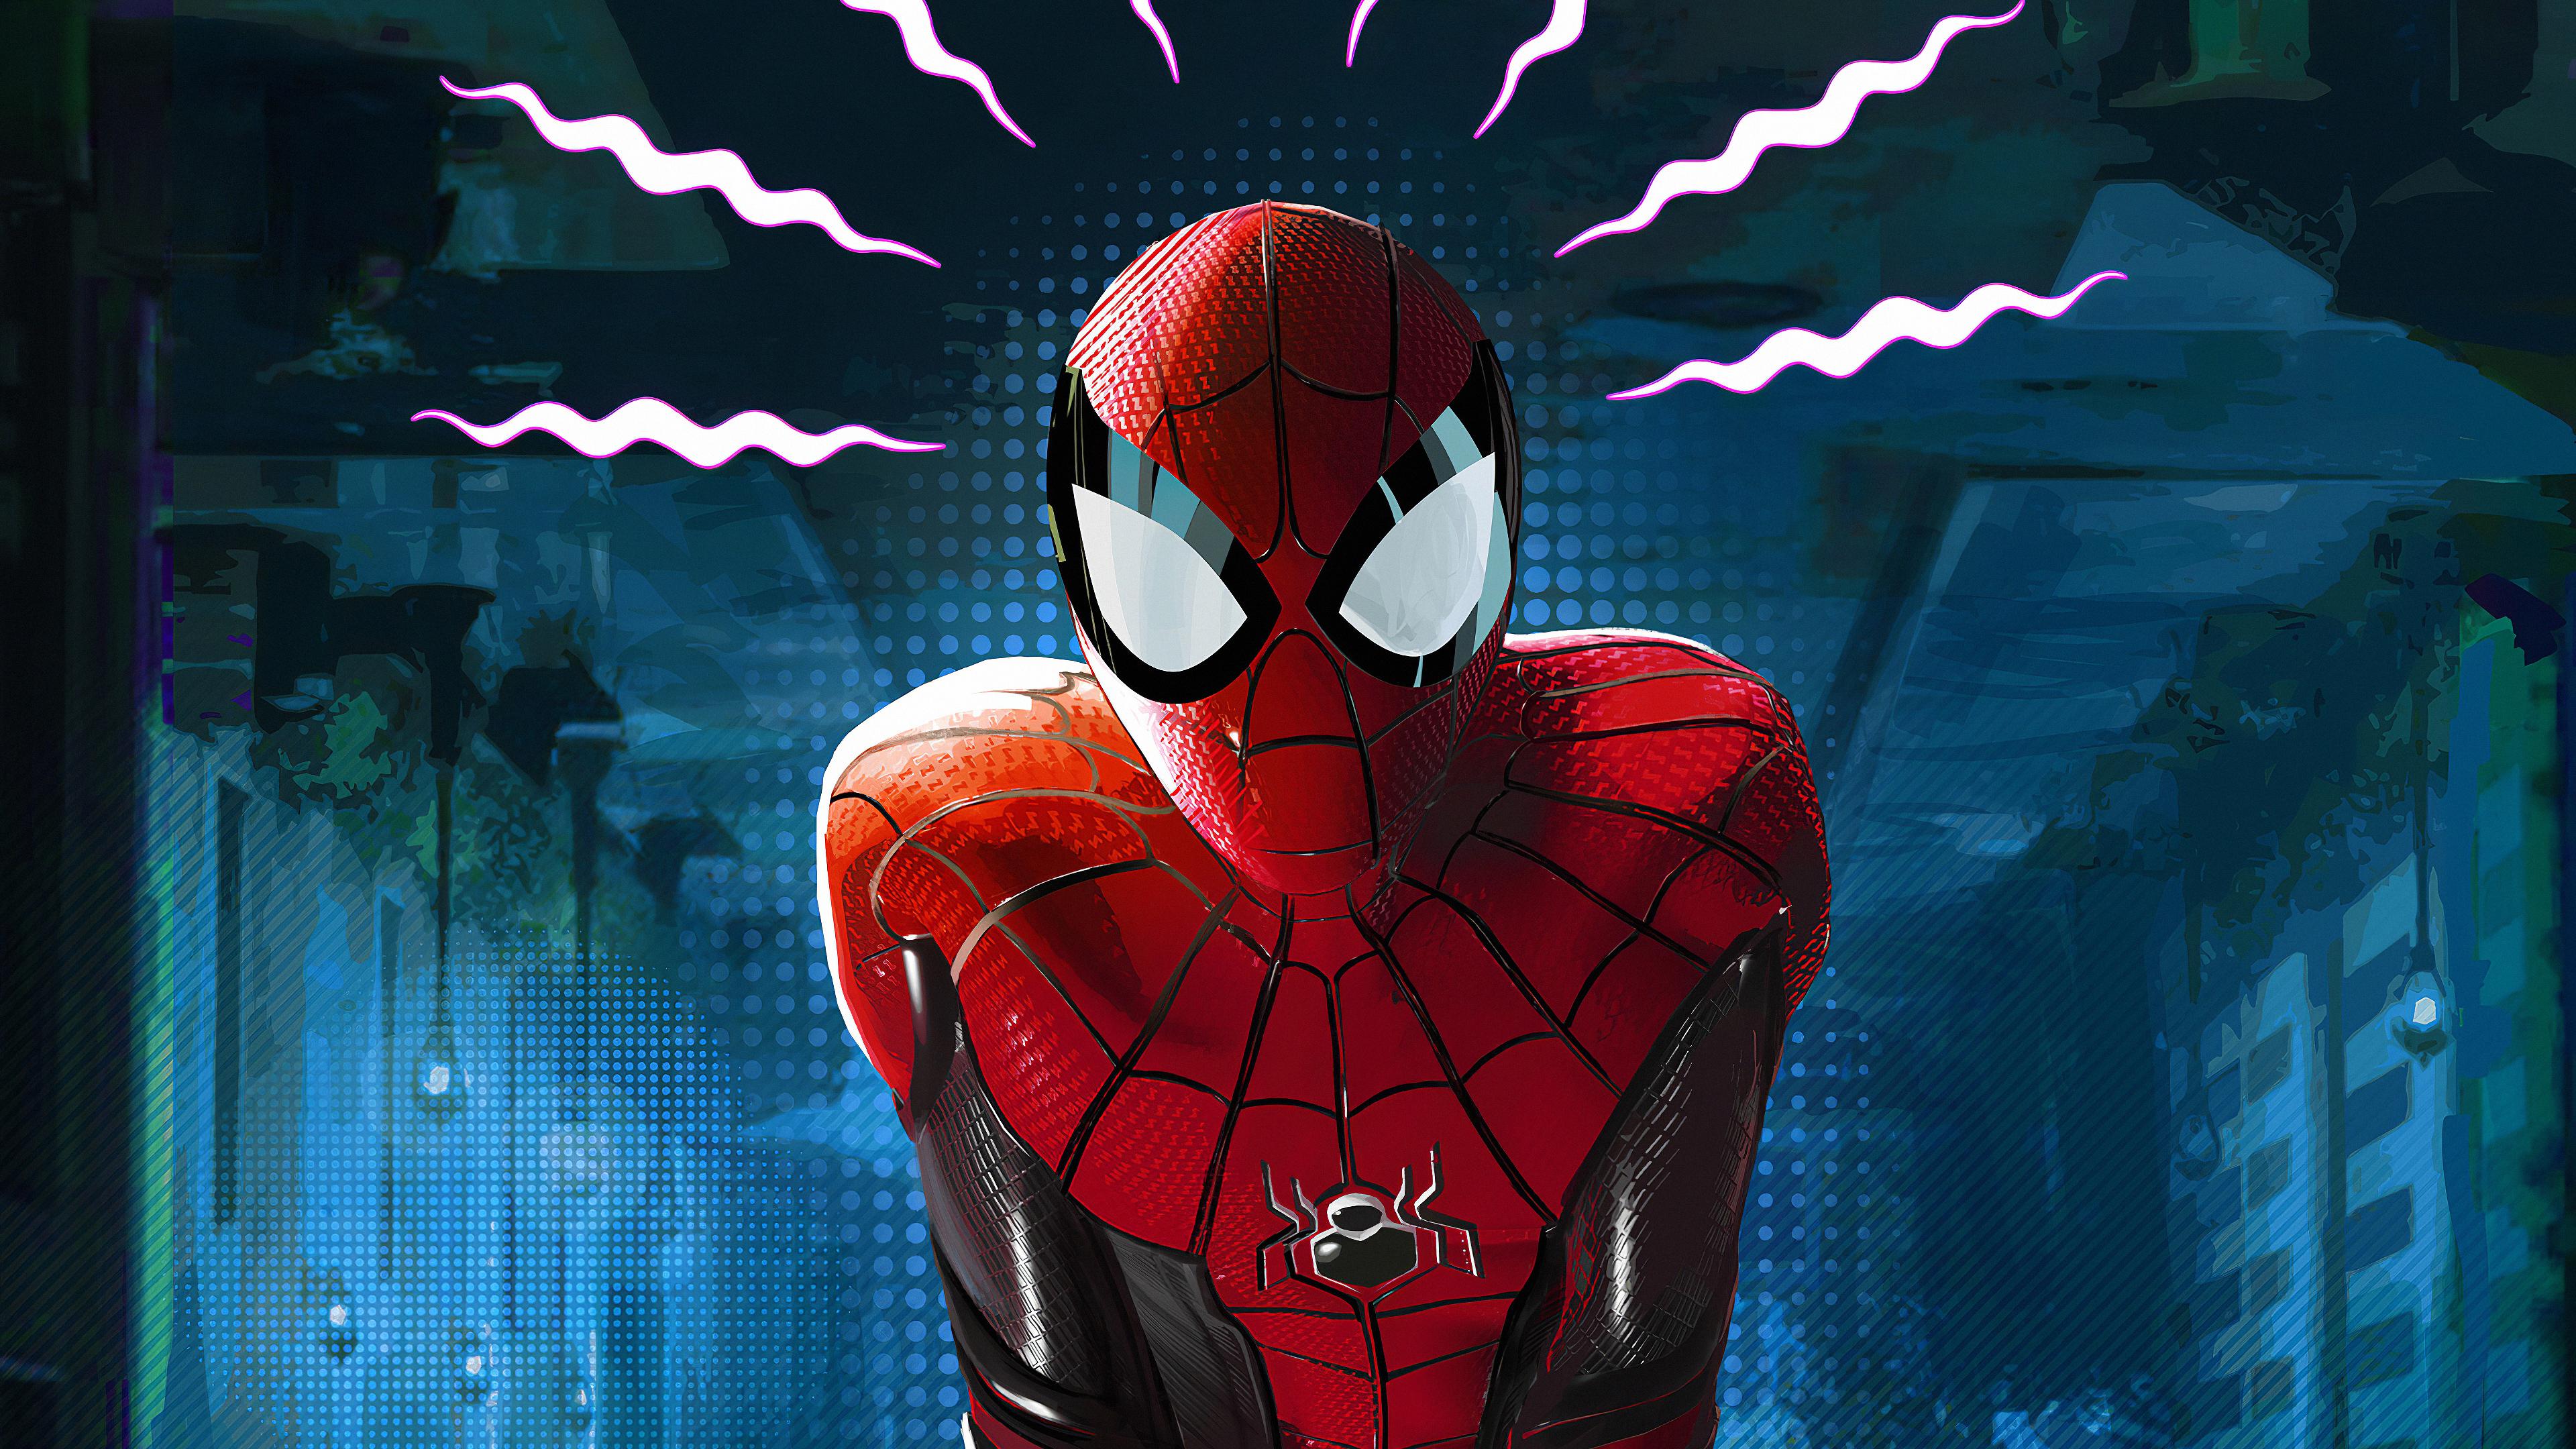 spiderman sense 1576092667 - Spiderman Sense - spiderman wallpaper phone hd 4k, Spiderman wallpaper 4k hd, spiderman art wallpaper hd 4k, spiderman 4k wallpaper